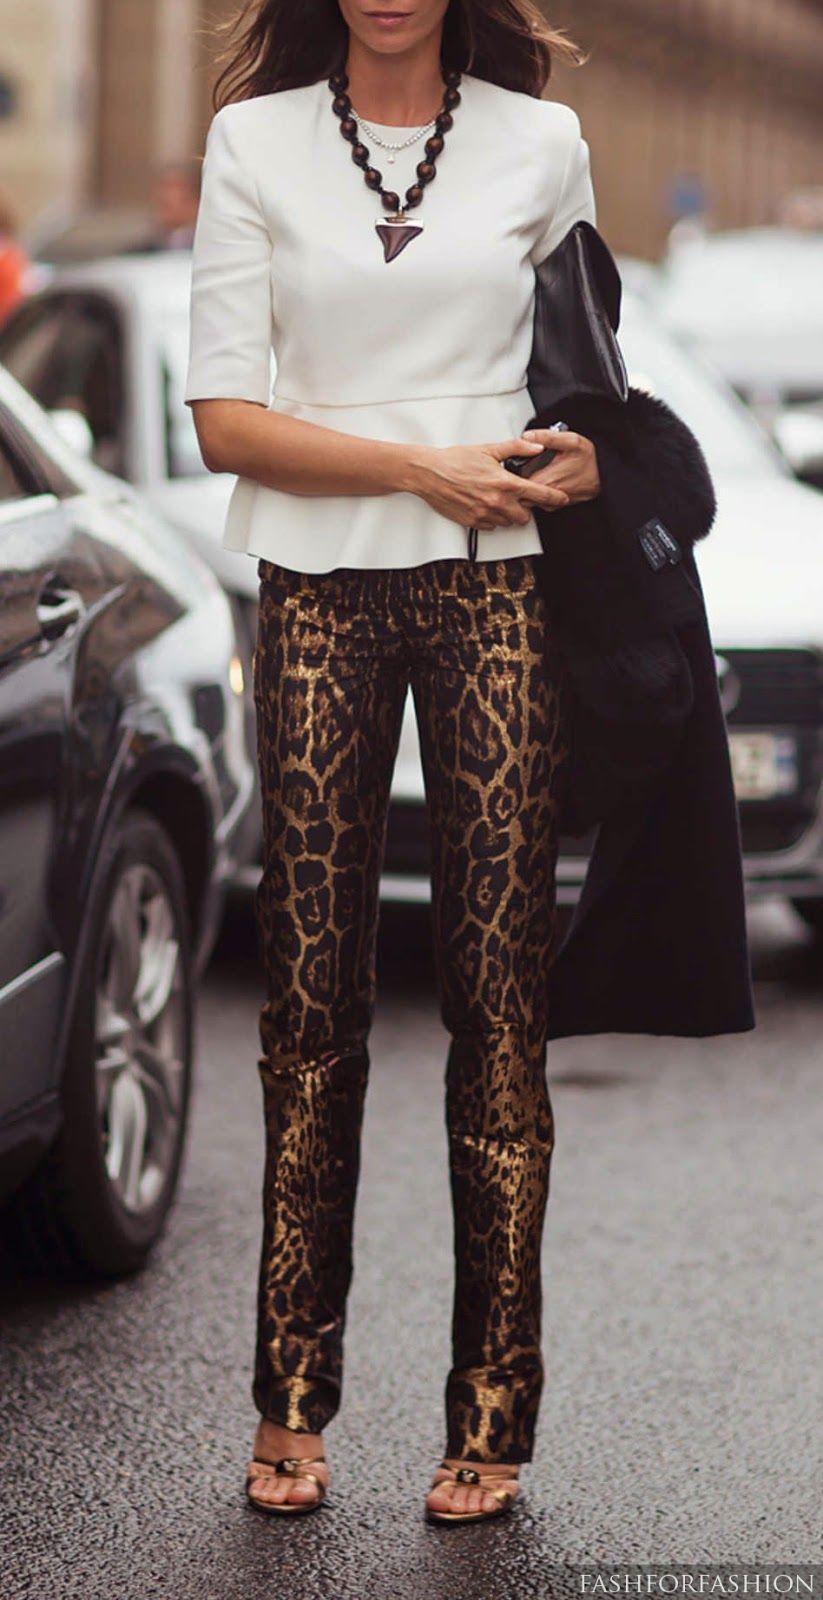 29d76daf843b STYLE INSPIRATIONS....Leopard Print Pants ♛ | Style, Beauty ...